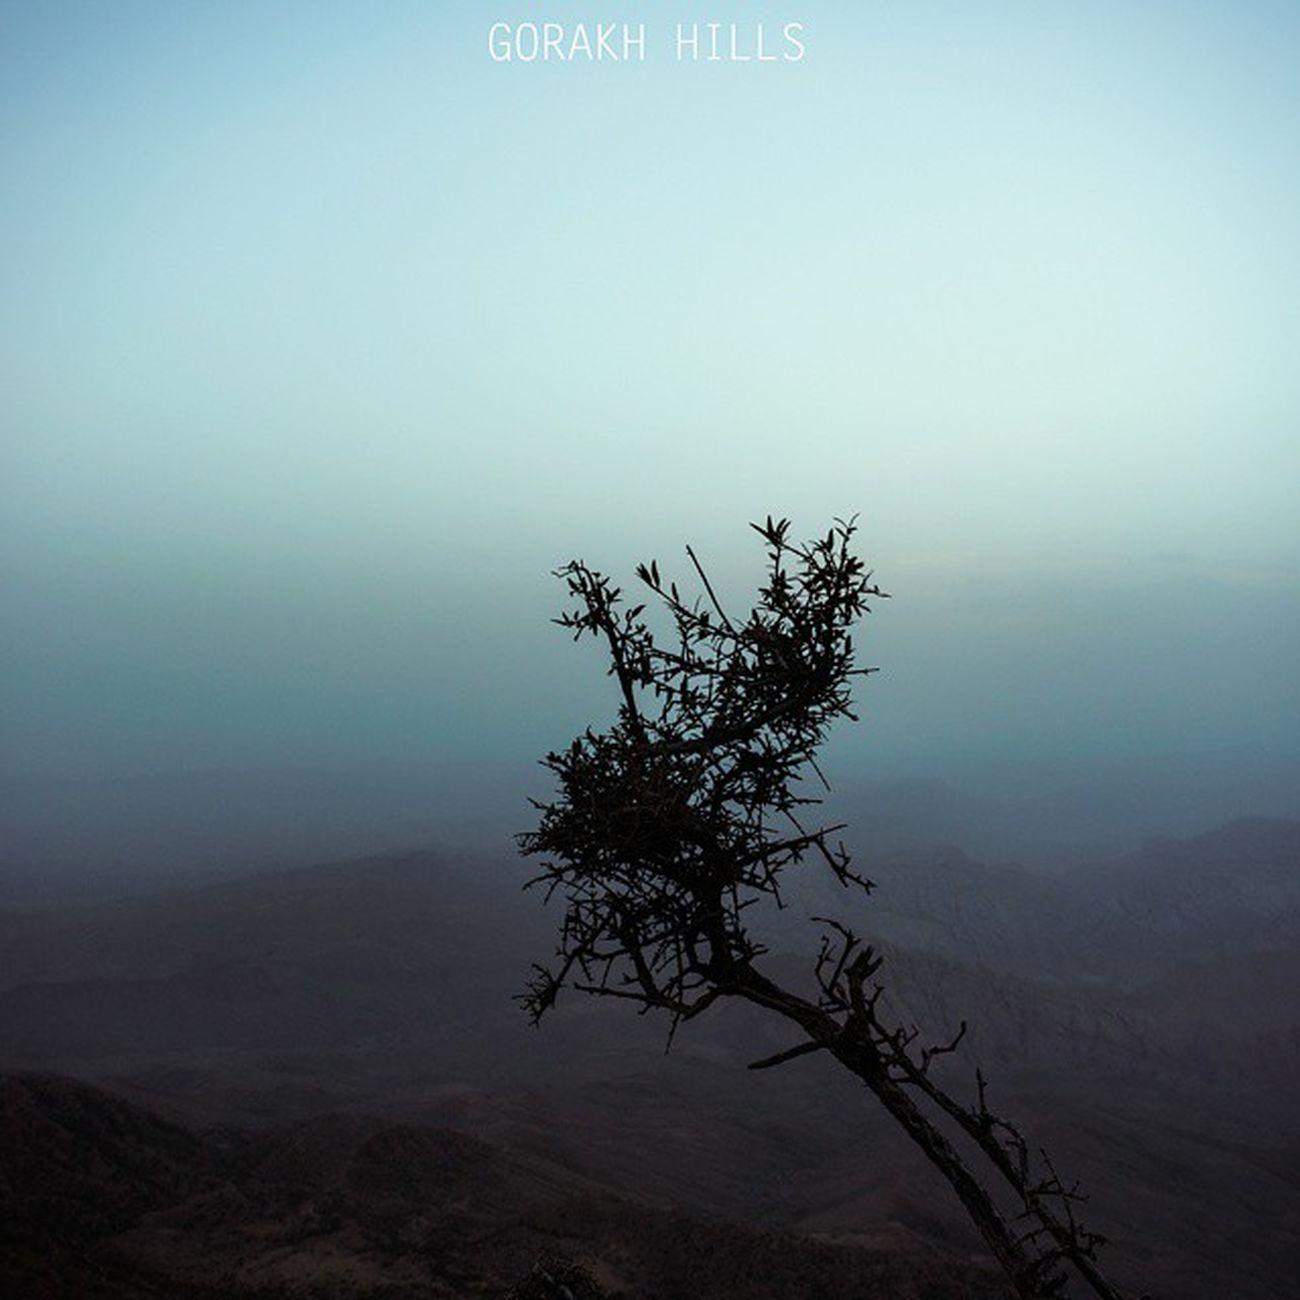 Gorakh Hills Gorakh Hills Sind Pakistan Nikon NikonPakistan Nikontop Hillshaveeyes